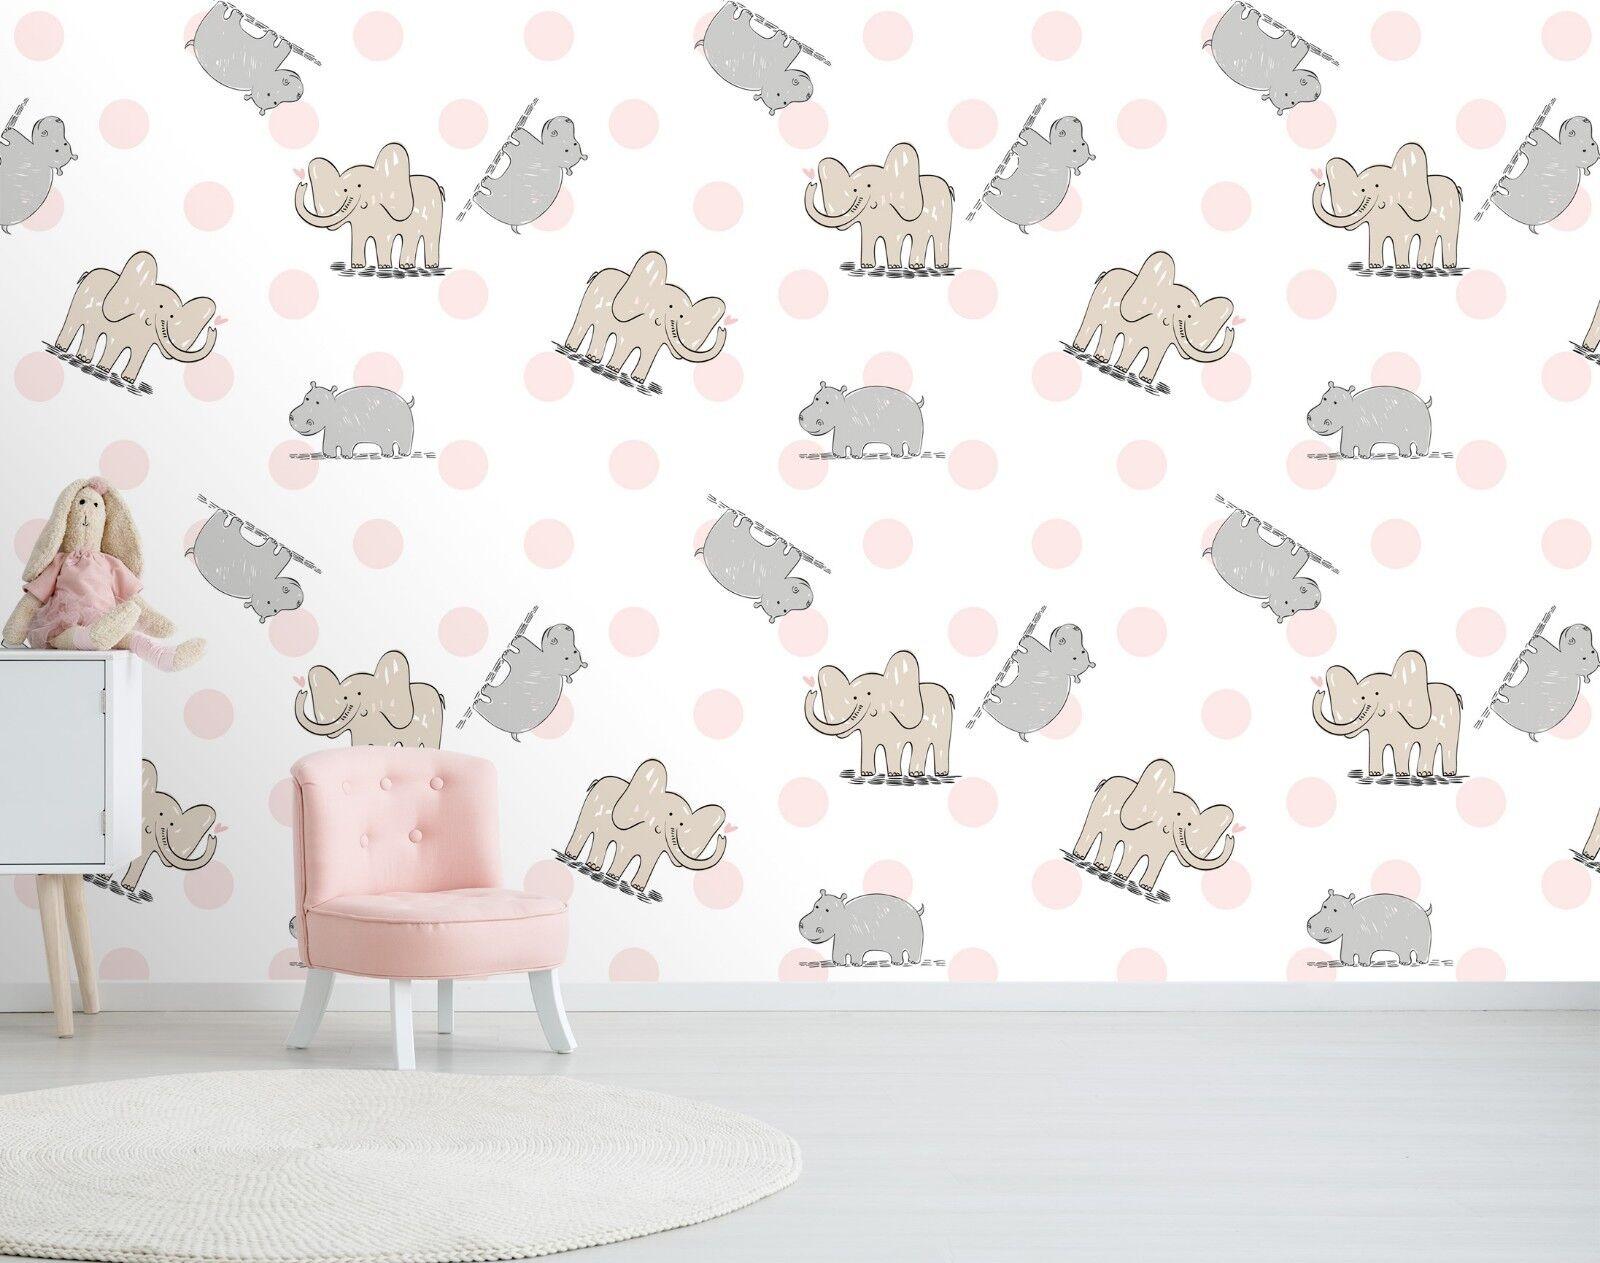 3D Hippo Elephant Animal 43 Wallpaper Murals Wall Print Wallpaper Mural AJ WALL